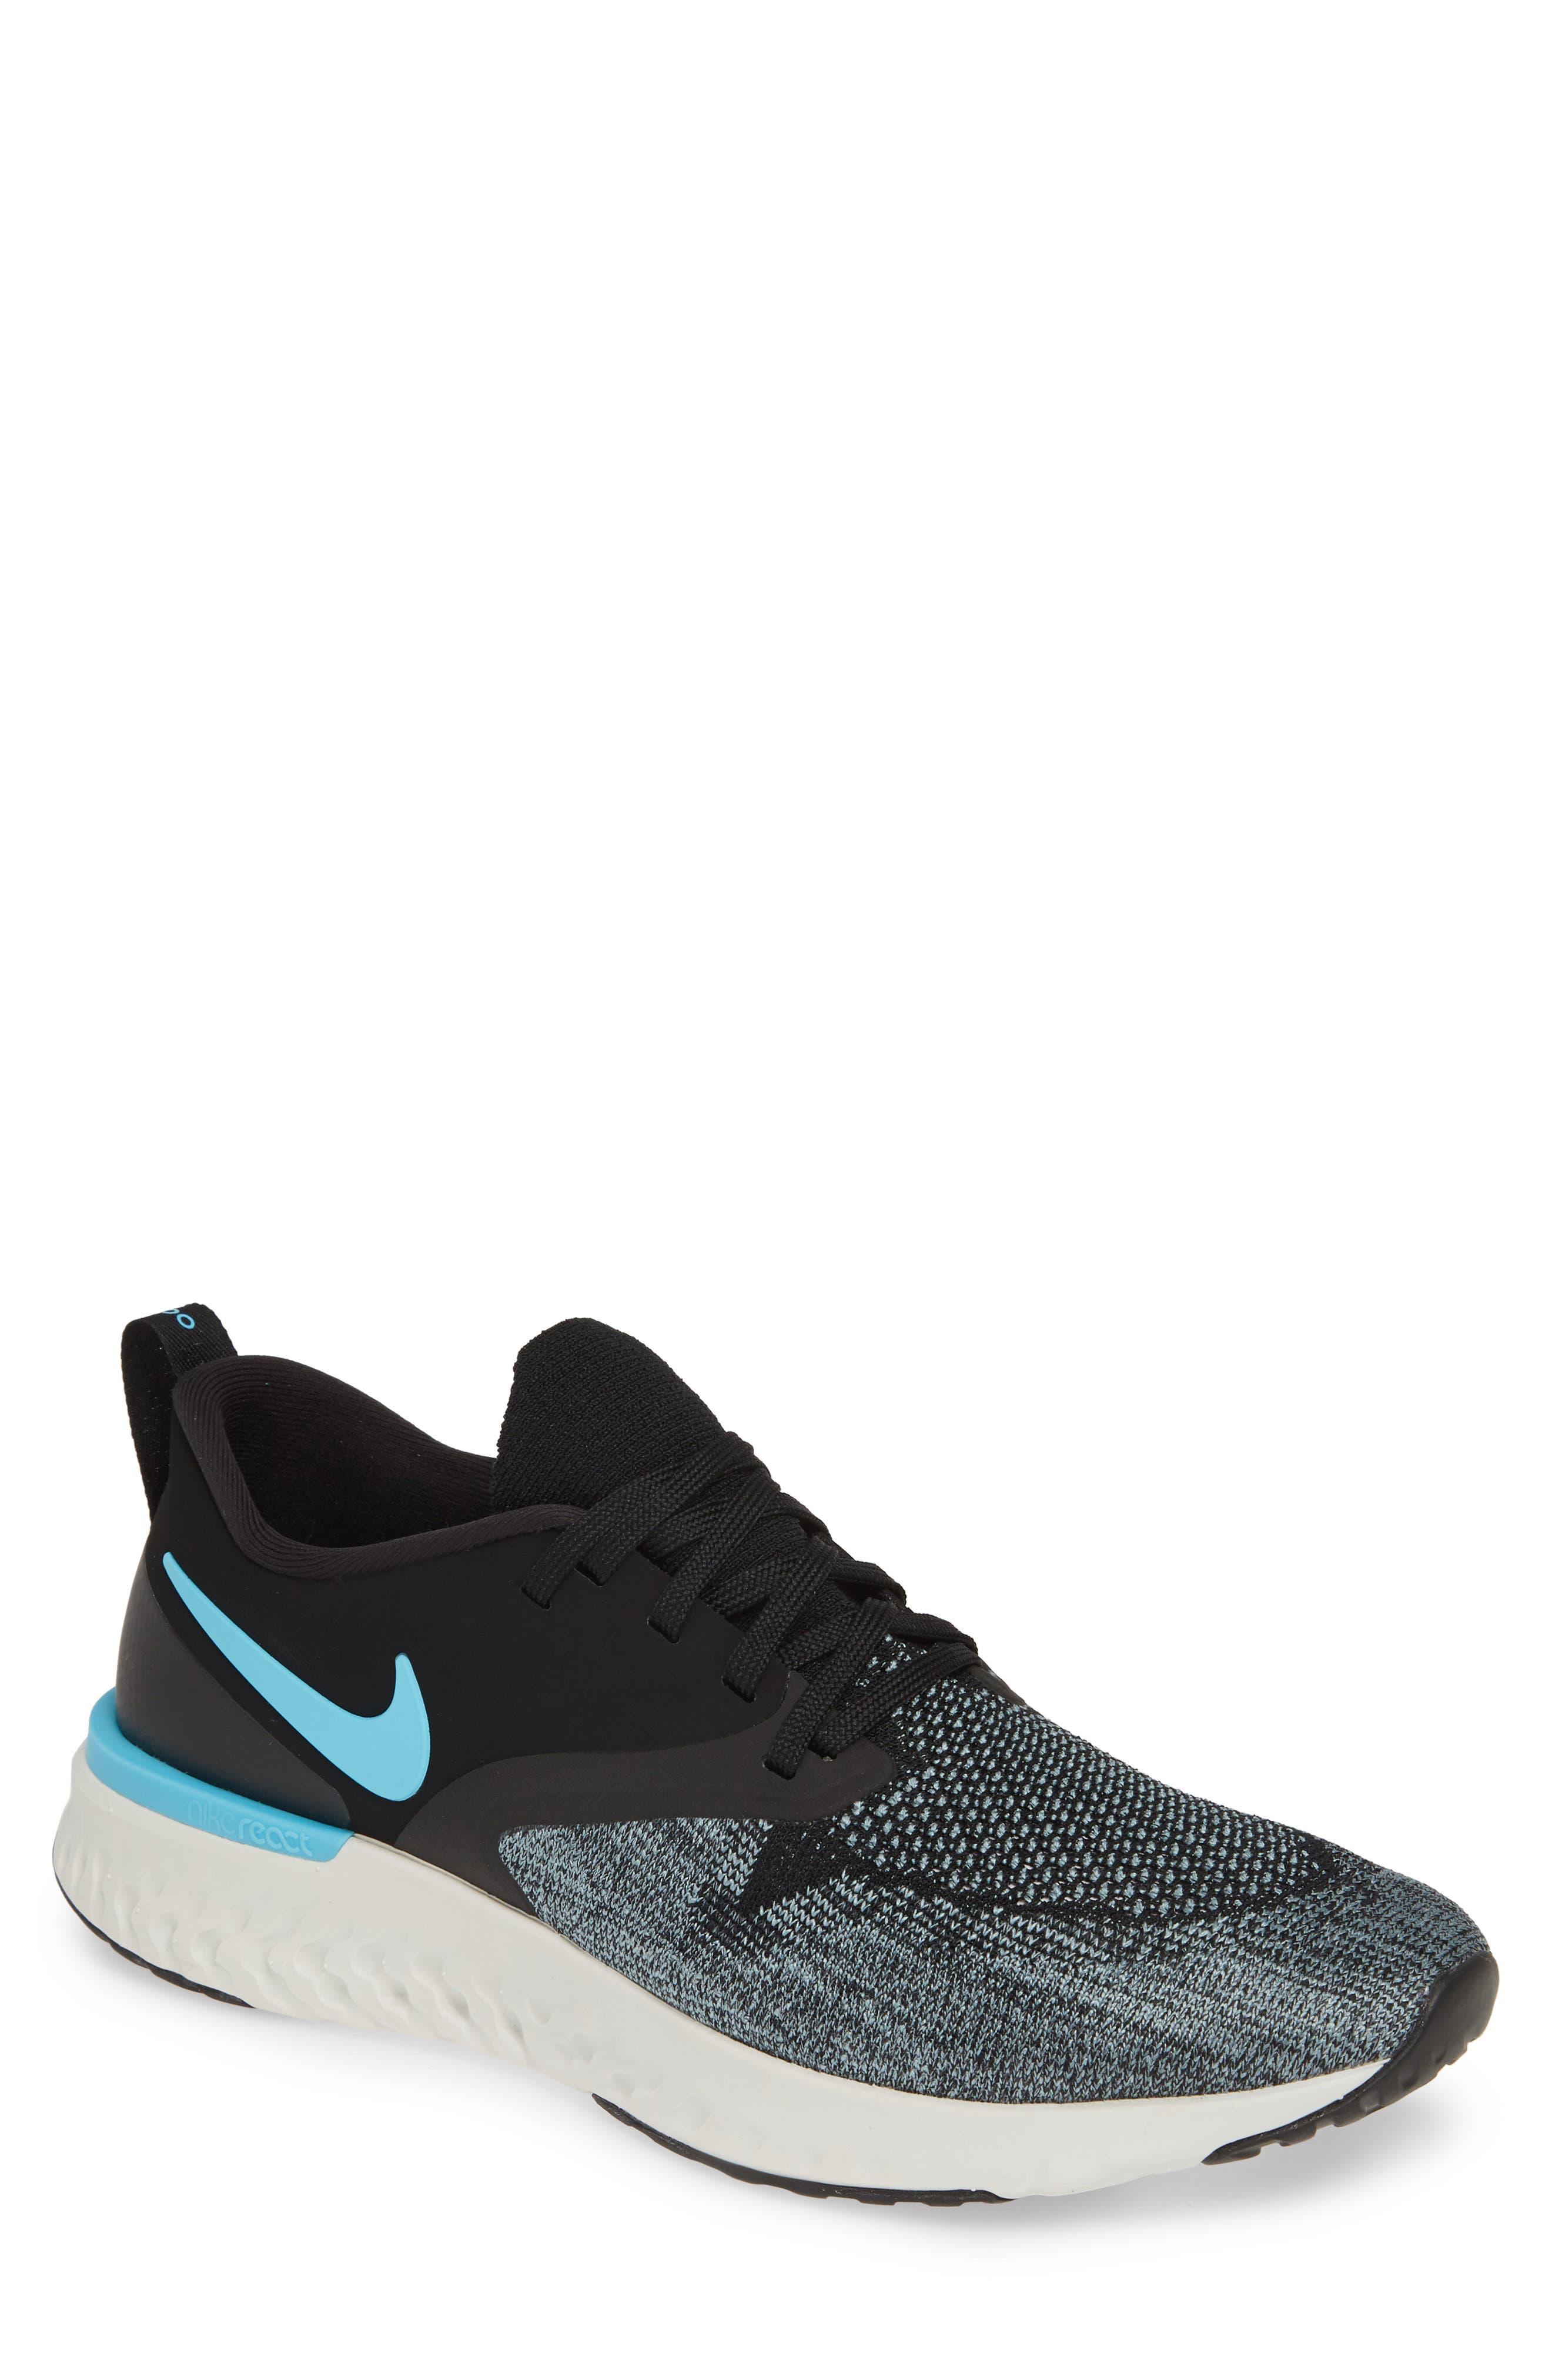 NIKE, Odyssey React 2 Flyknit Running Shoe, Main thumbnail 1, color, BLACK/ BLUE FURY/ AVIATOR GREY